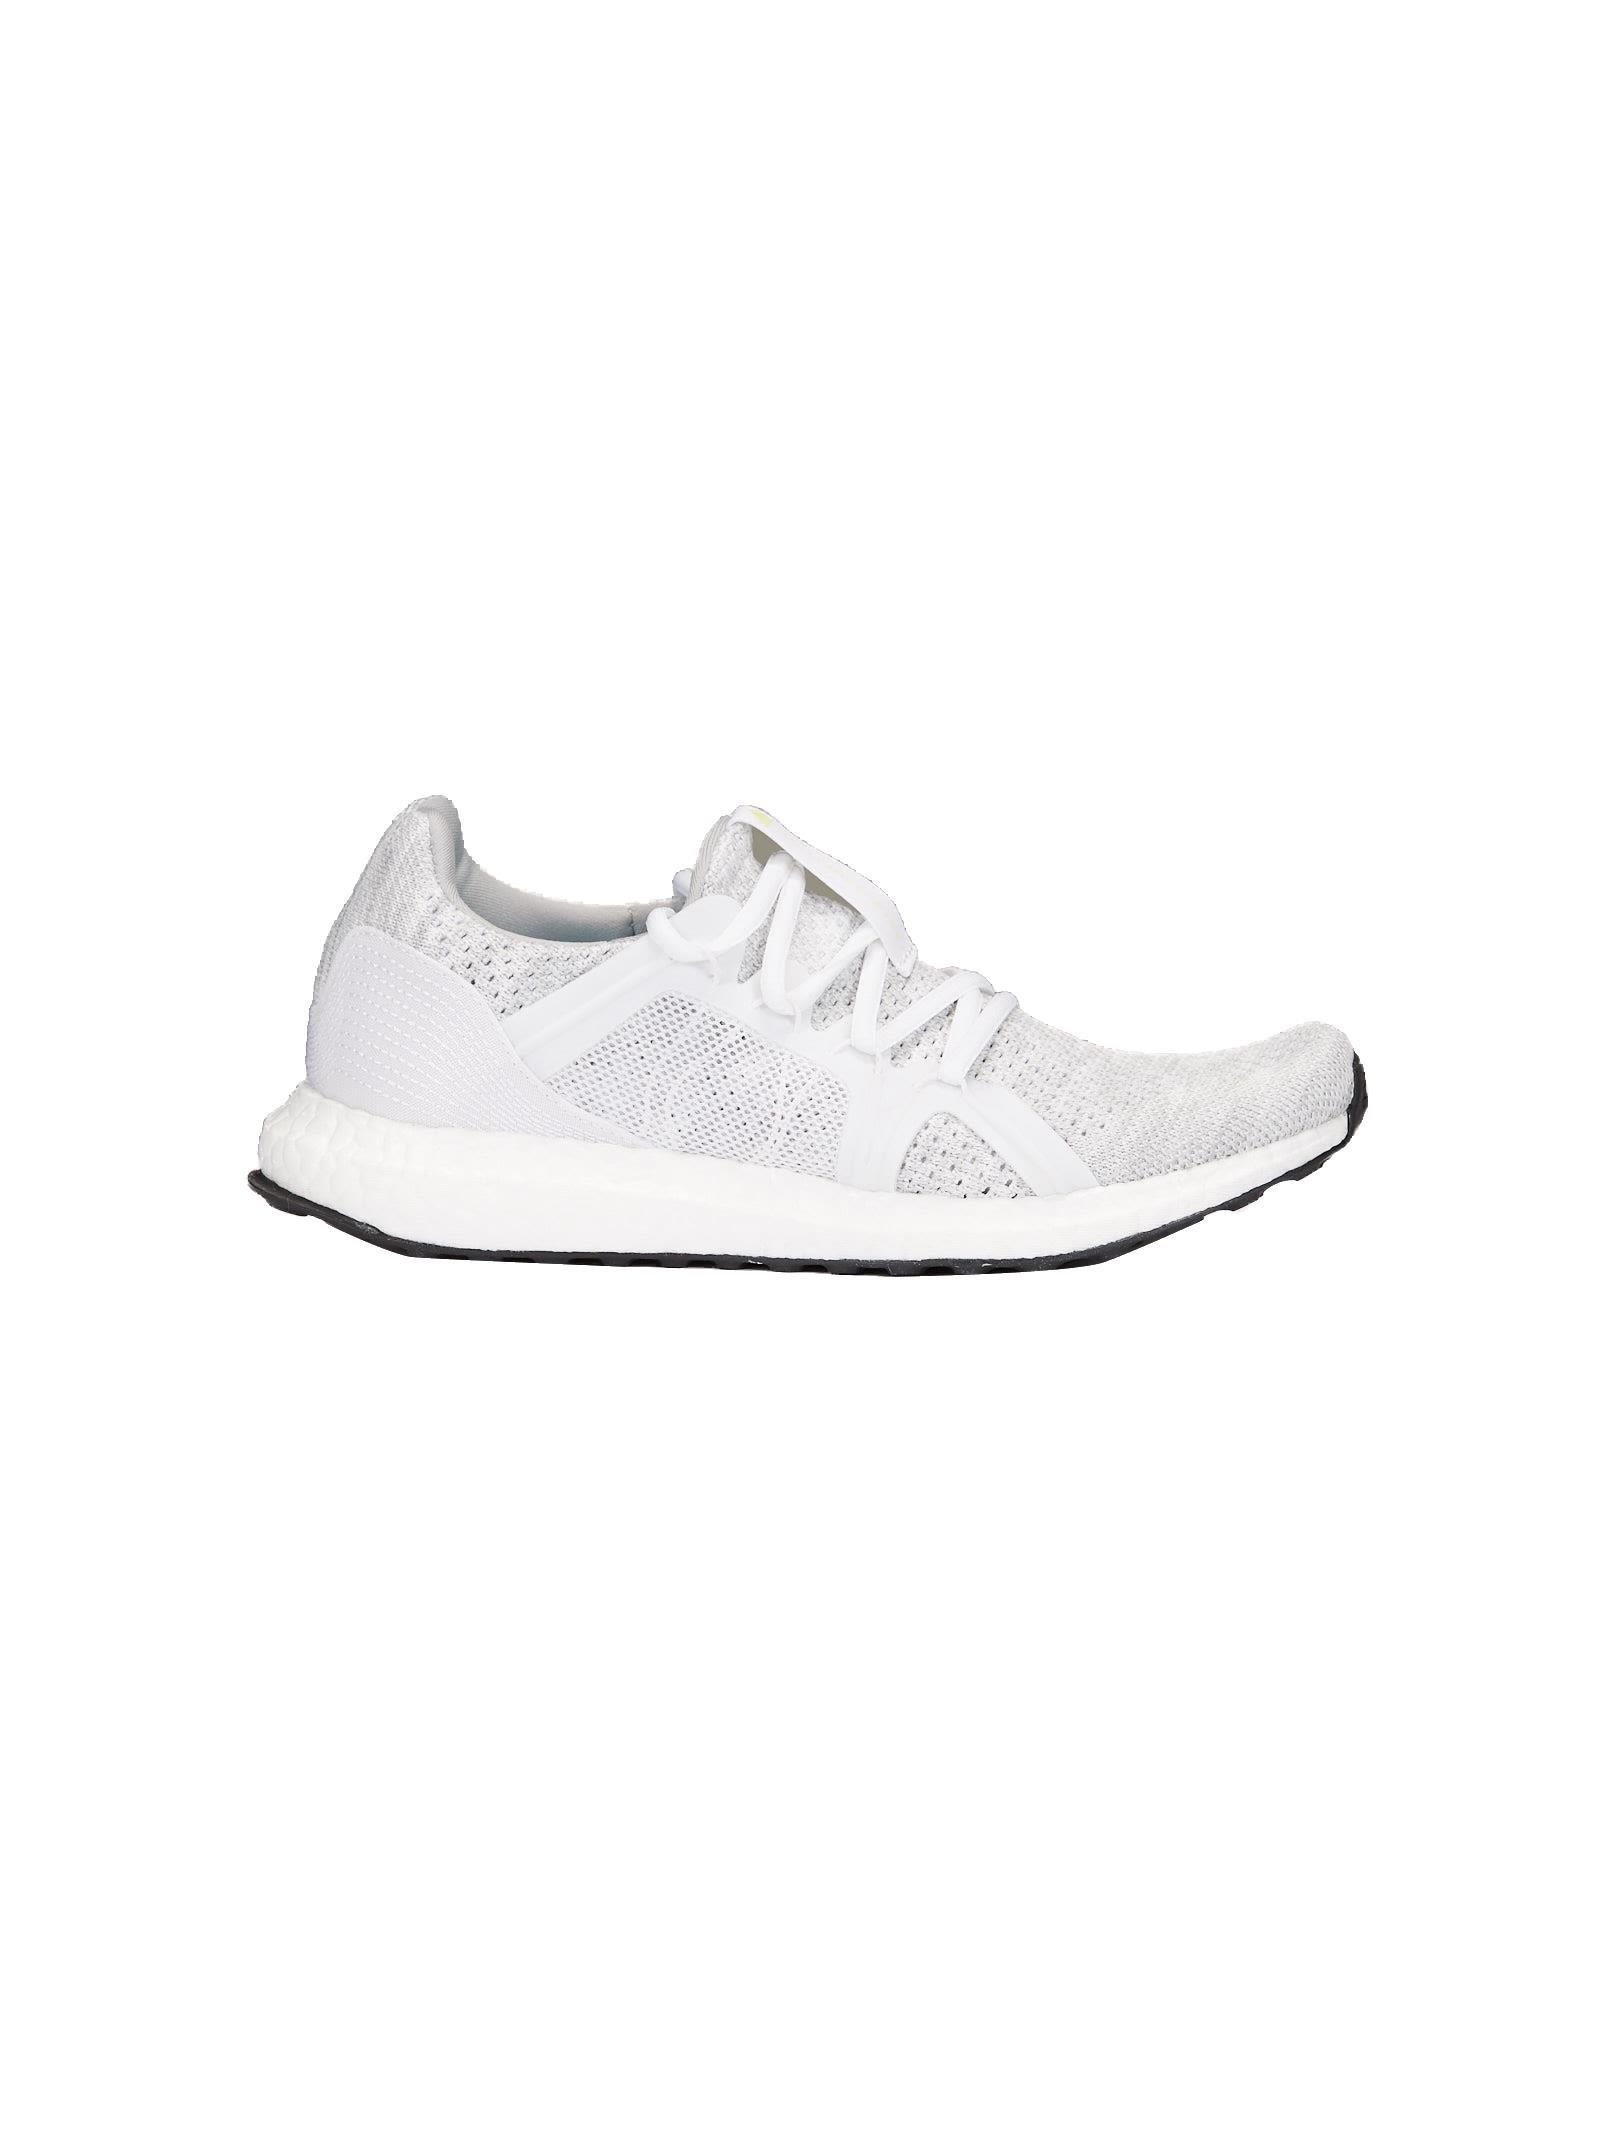 Adidas By Stella Mccartney Ultra Boost Sneakers ...